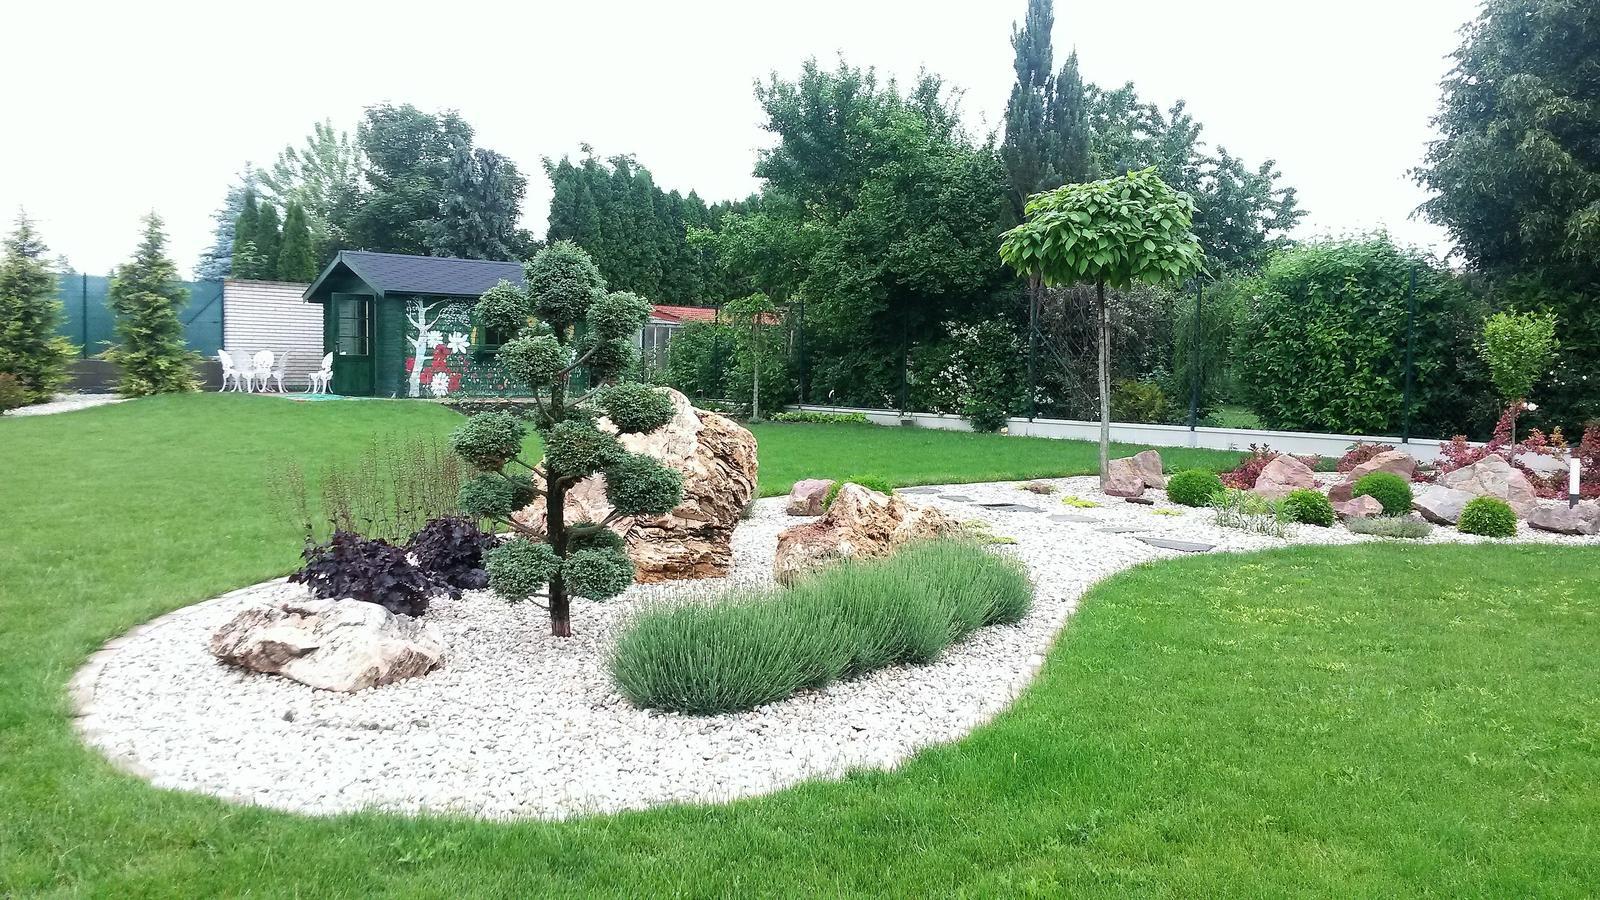 Zahradka4./2014 - Obrázok č. 22